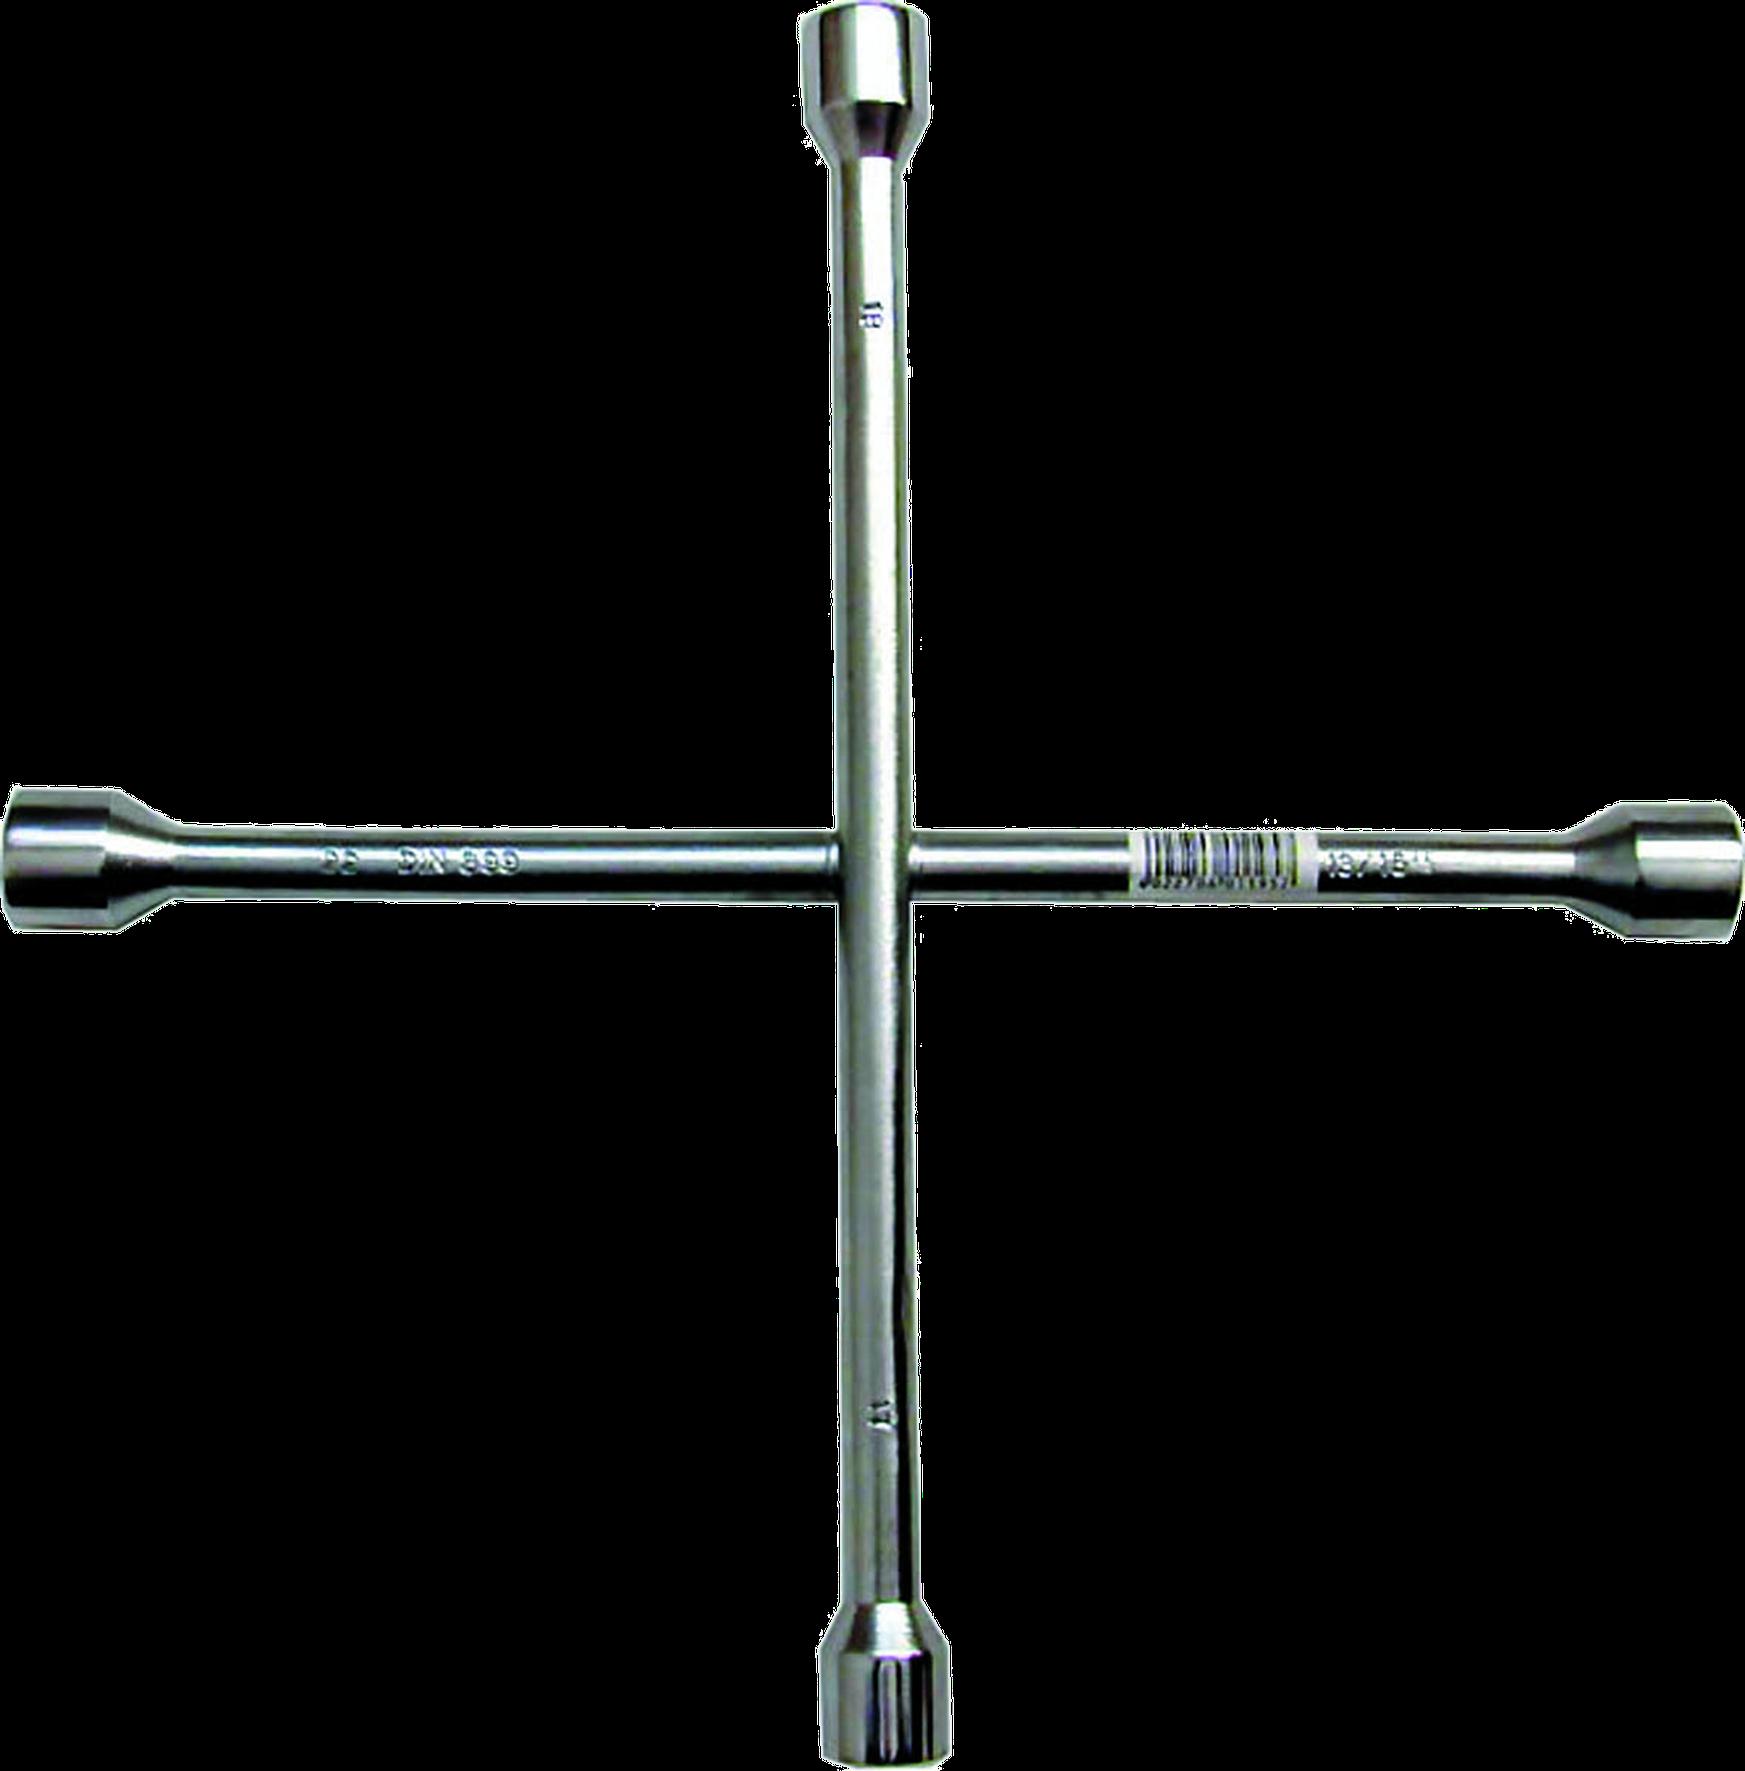 SWSTAHL Radkreuzschlüssel DIN 899, verchromt 02200L